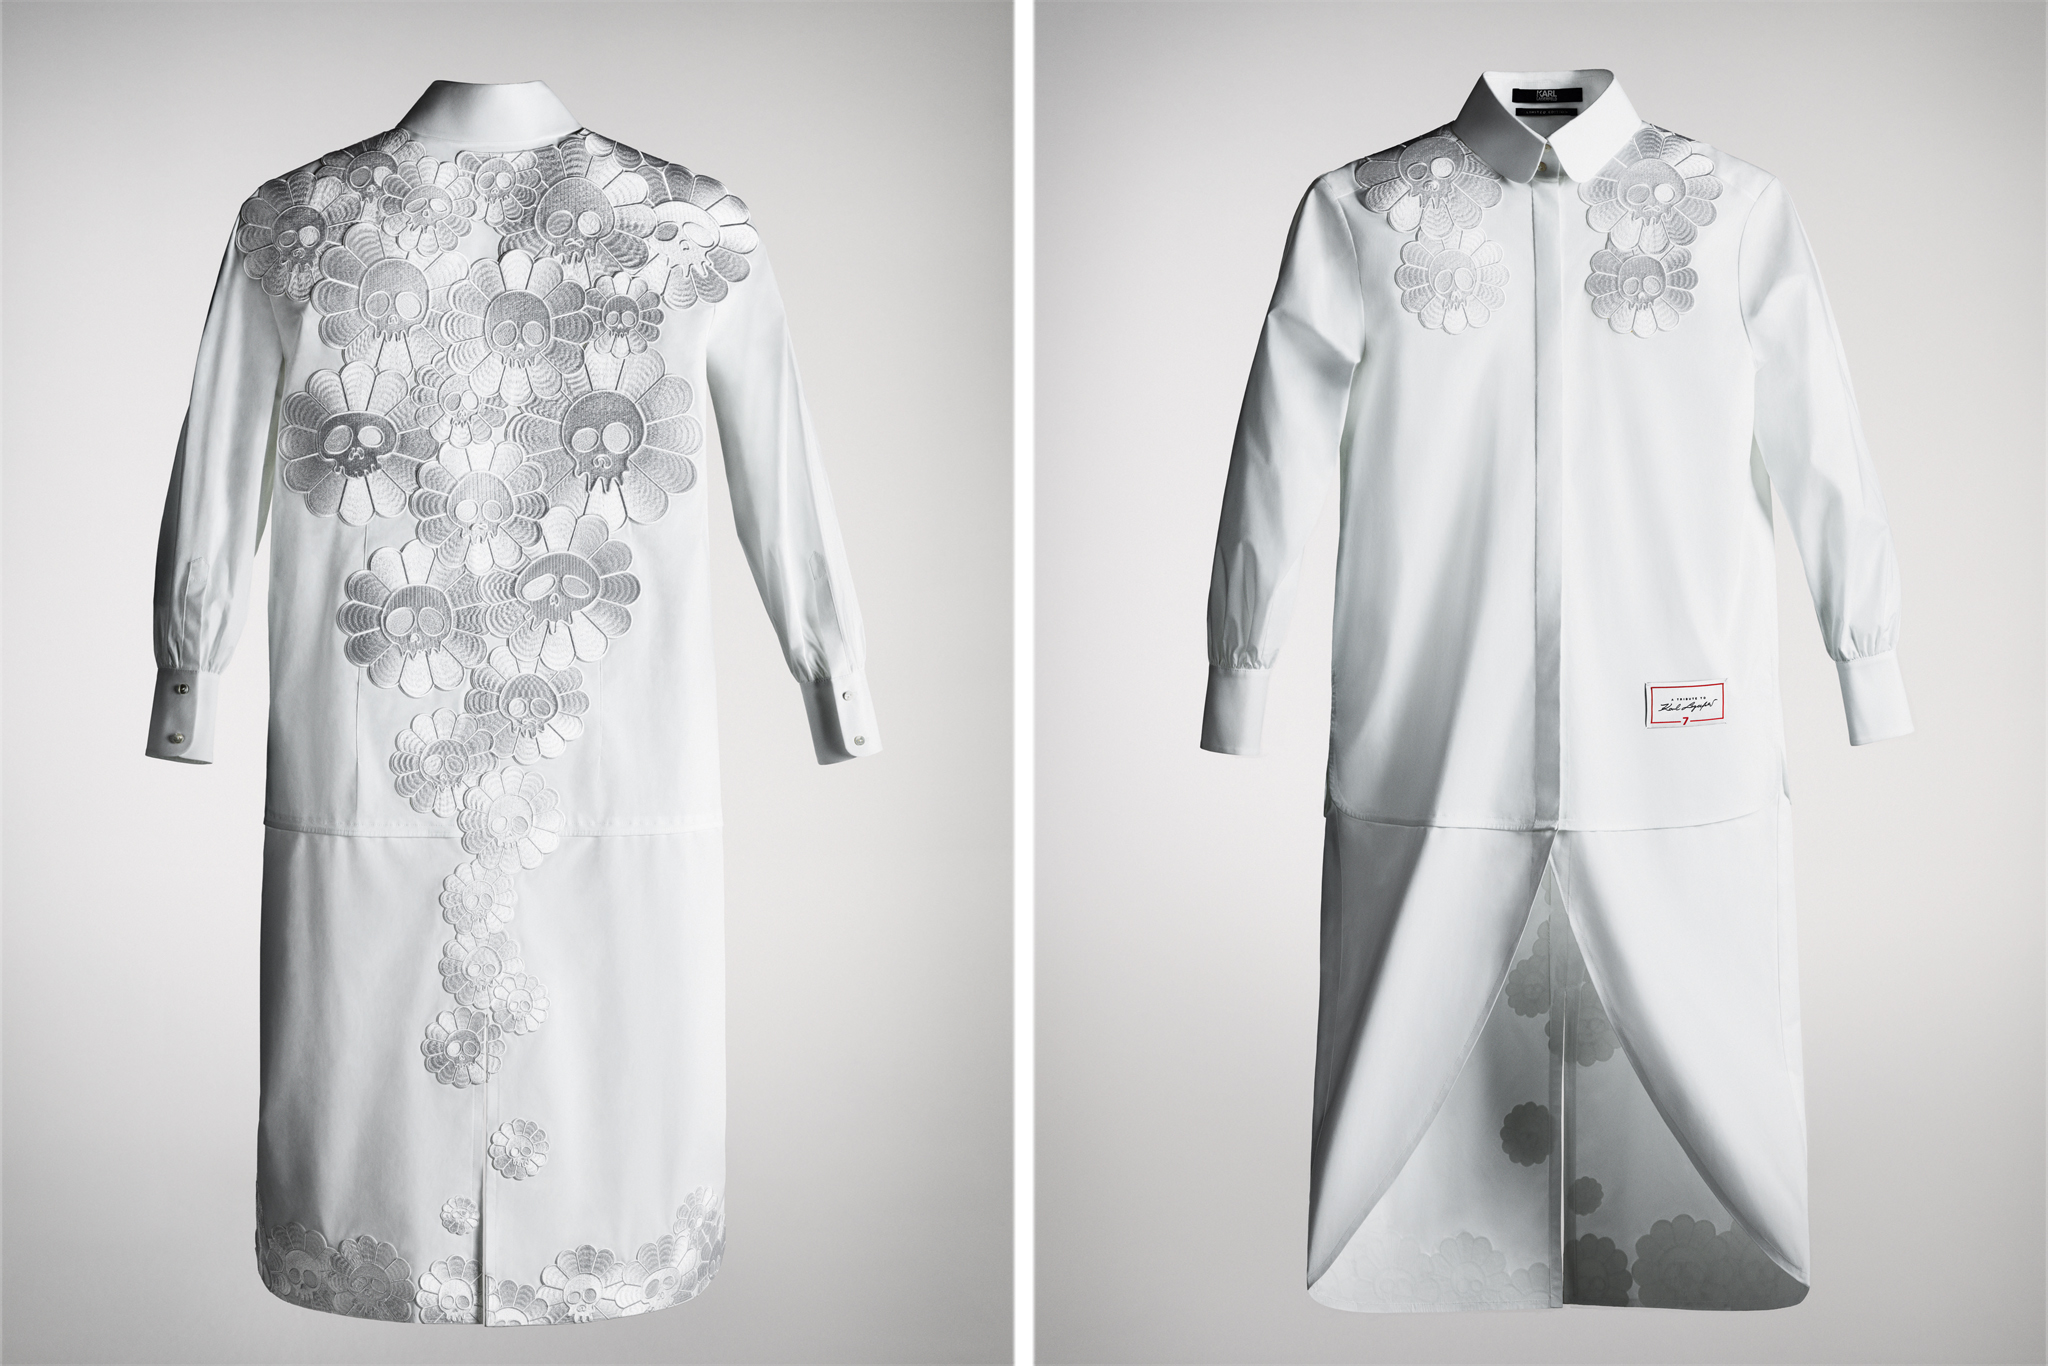 The shirt designed by Takashi Murakami